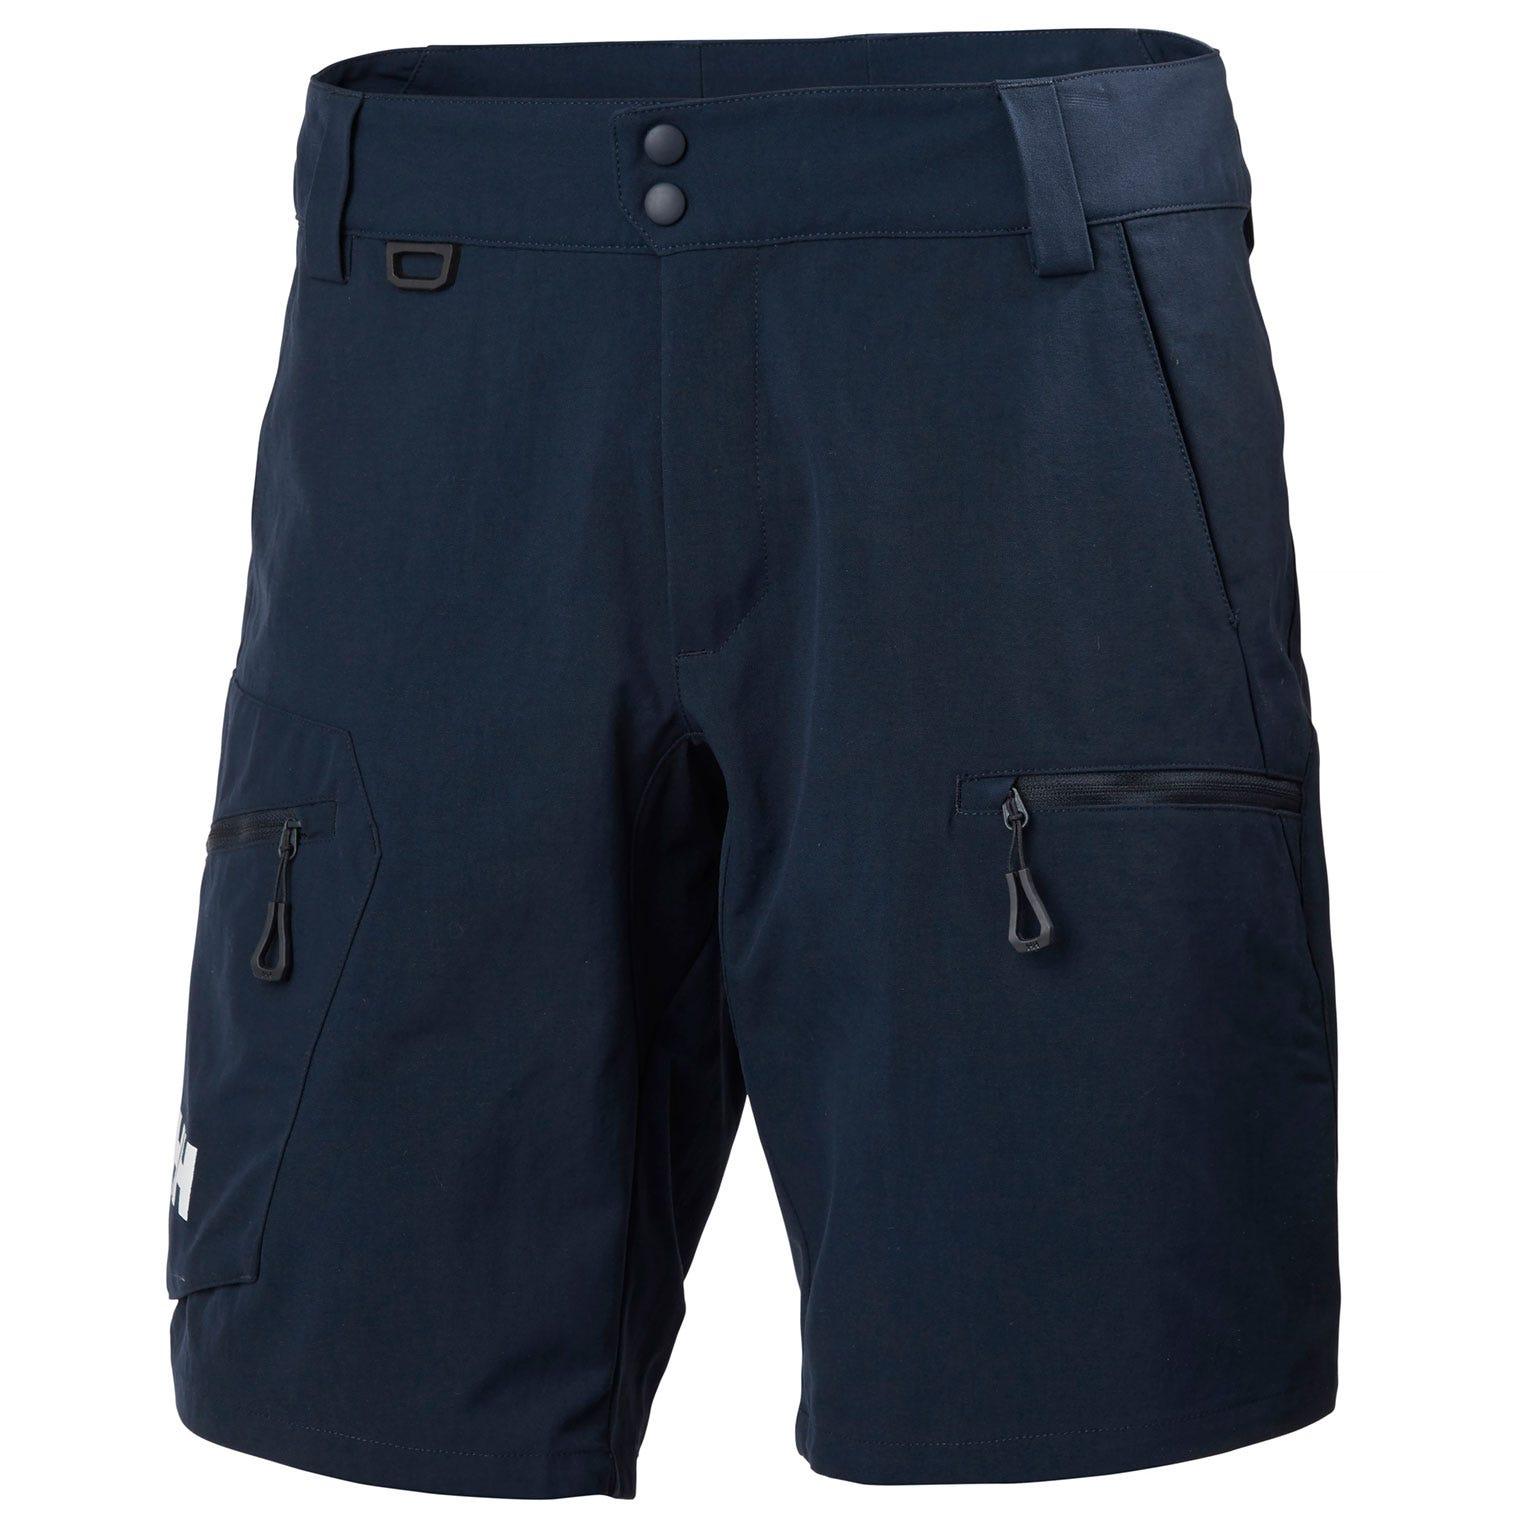 Helly Hansen Crewline Cargo Shorts Mens Sailing Pant Navy 38